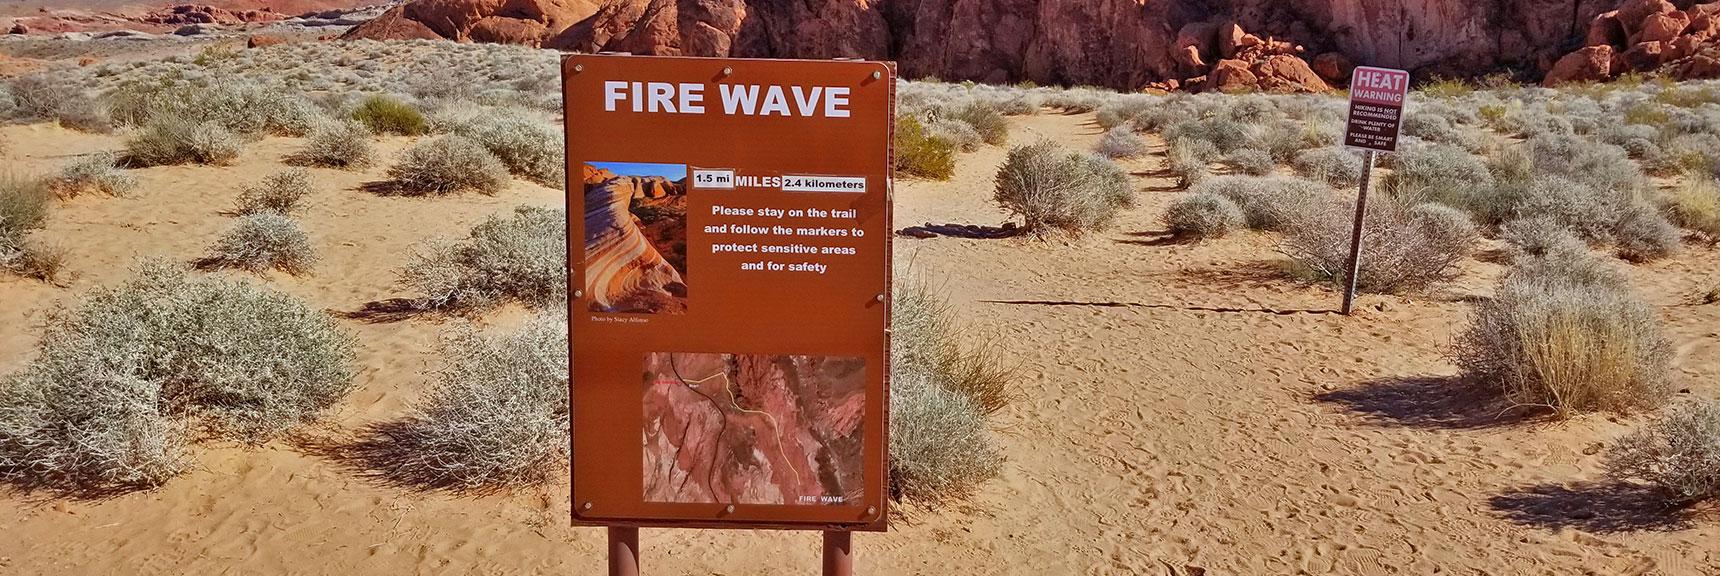 Firewave in Valley of Fire State Park, Nevada, Slide 001